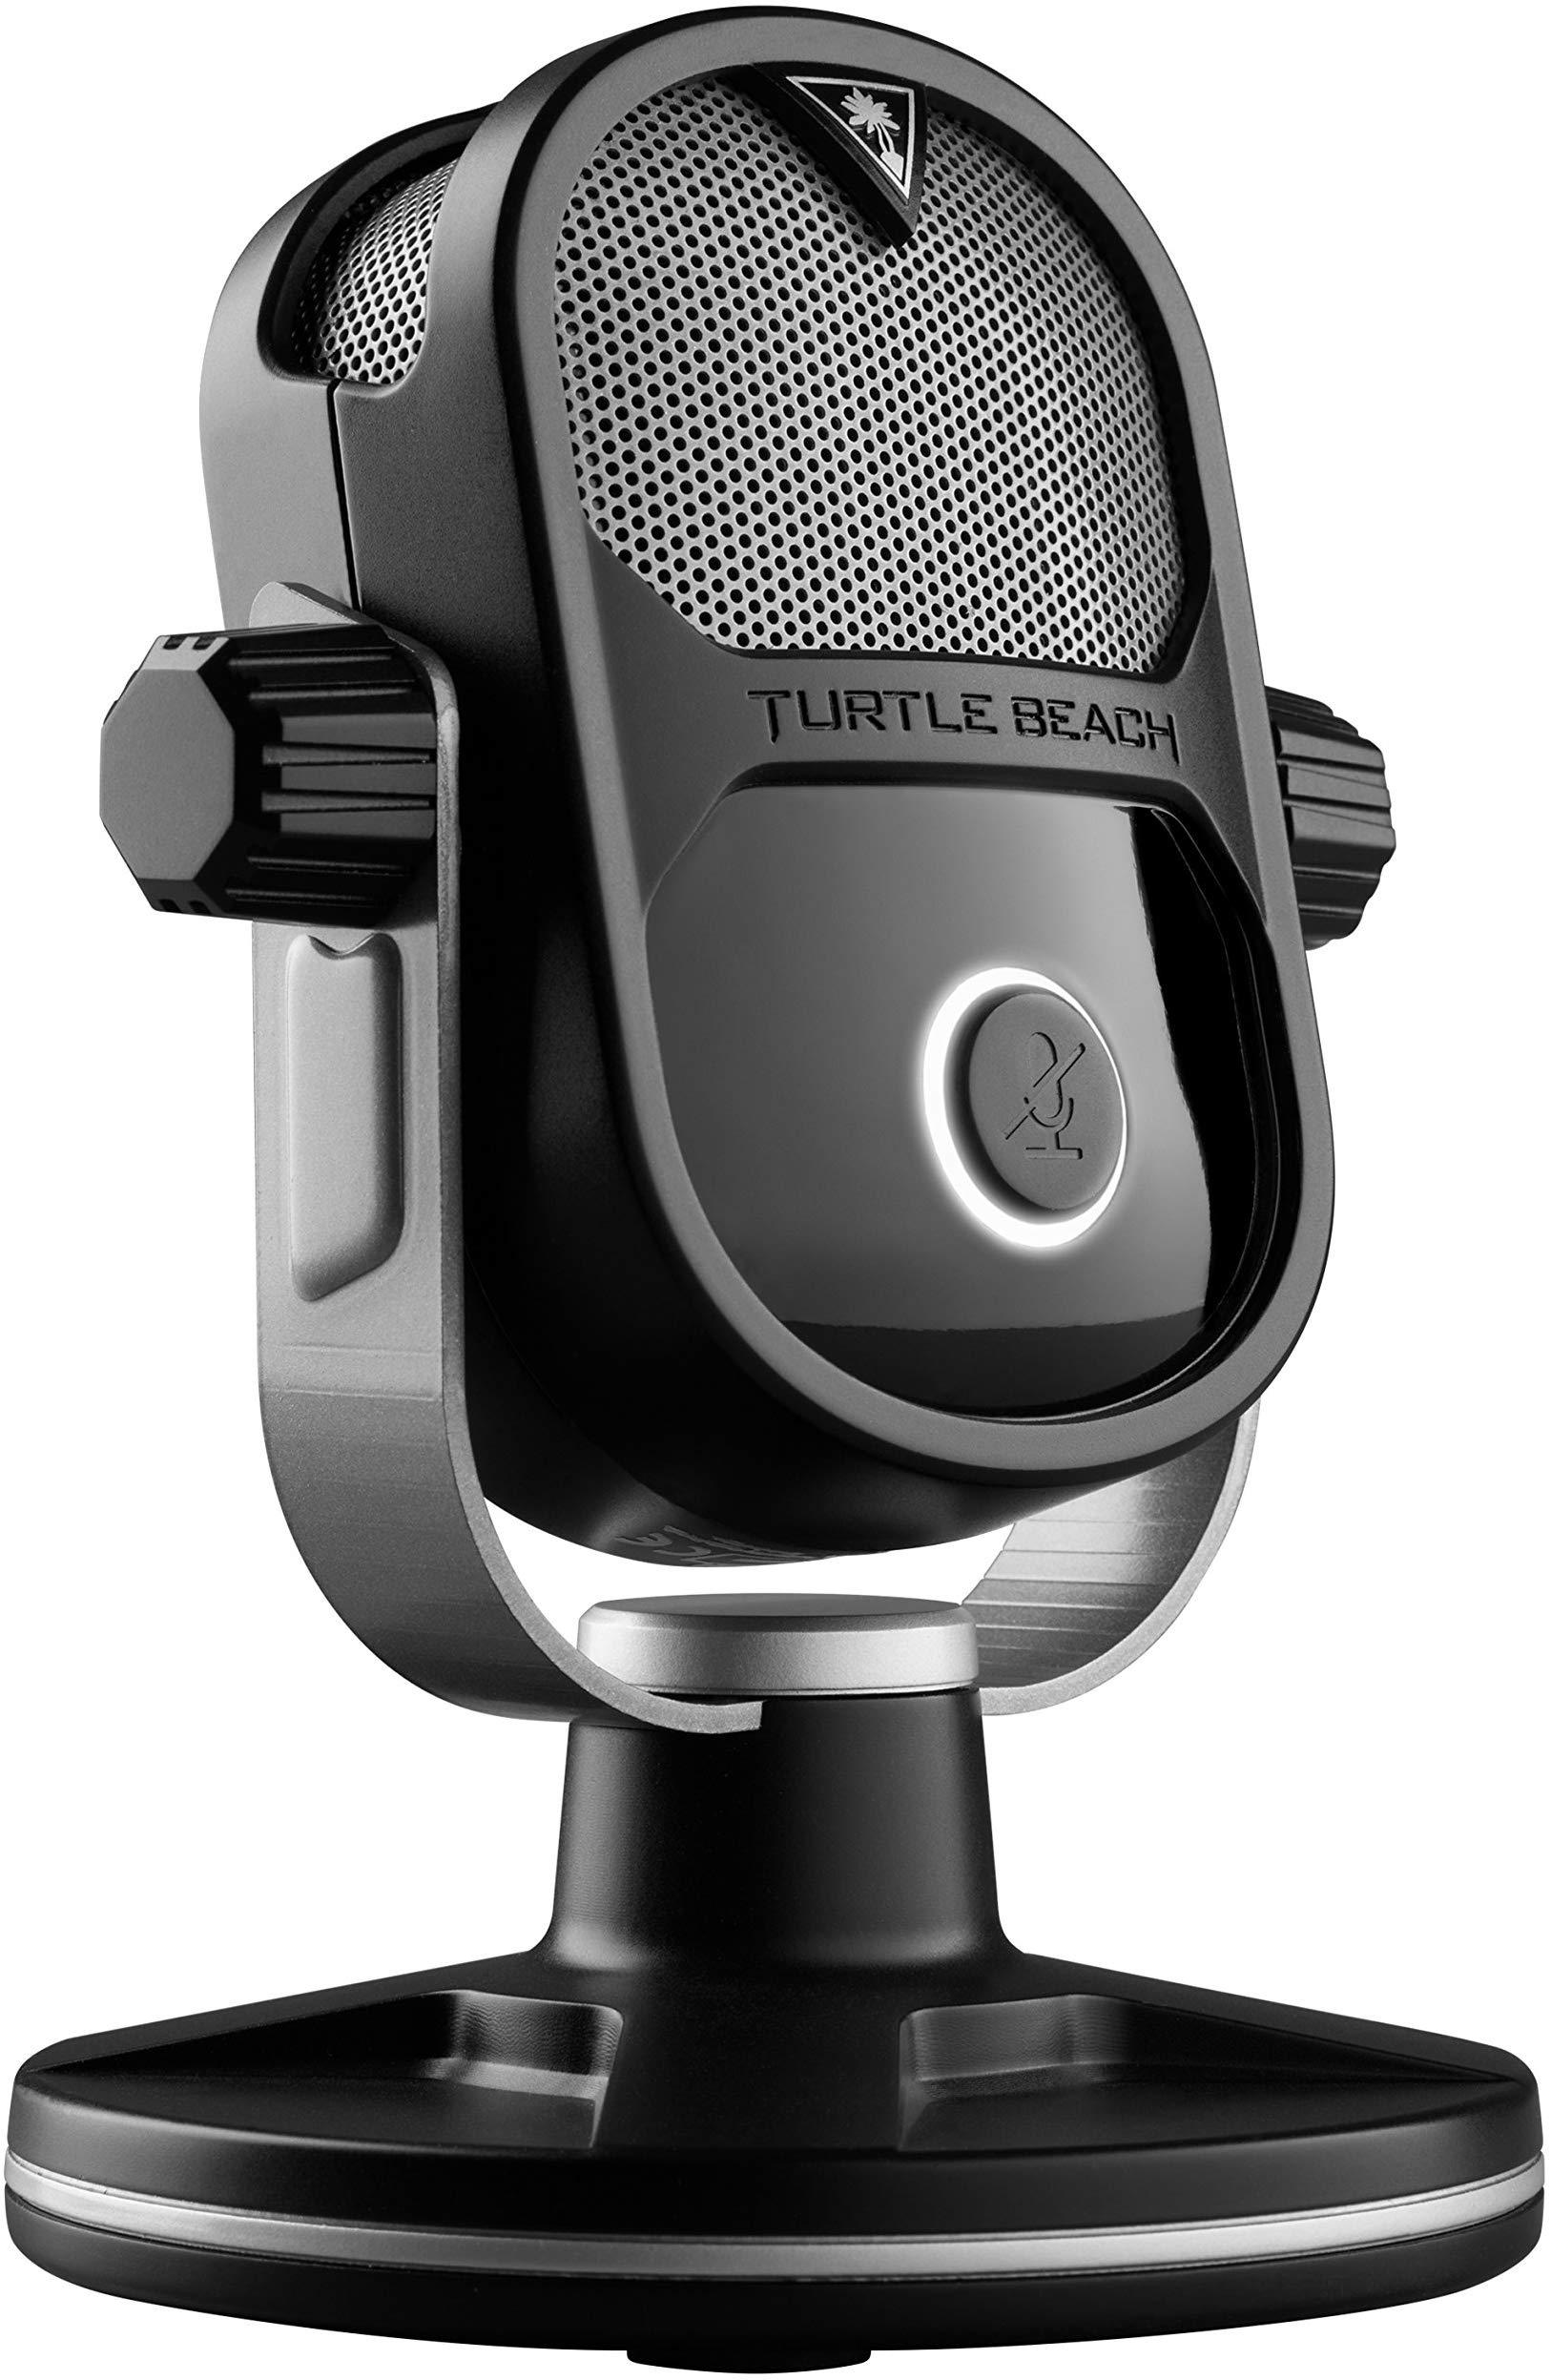 Turtle Beach - Universal digital USB Stream Mic - TruSpeak - Xbox One, PS4 and PC